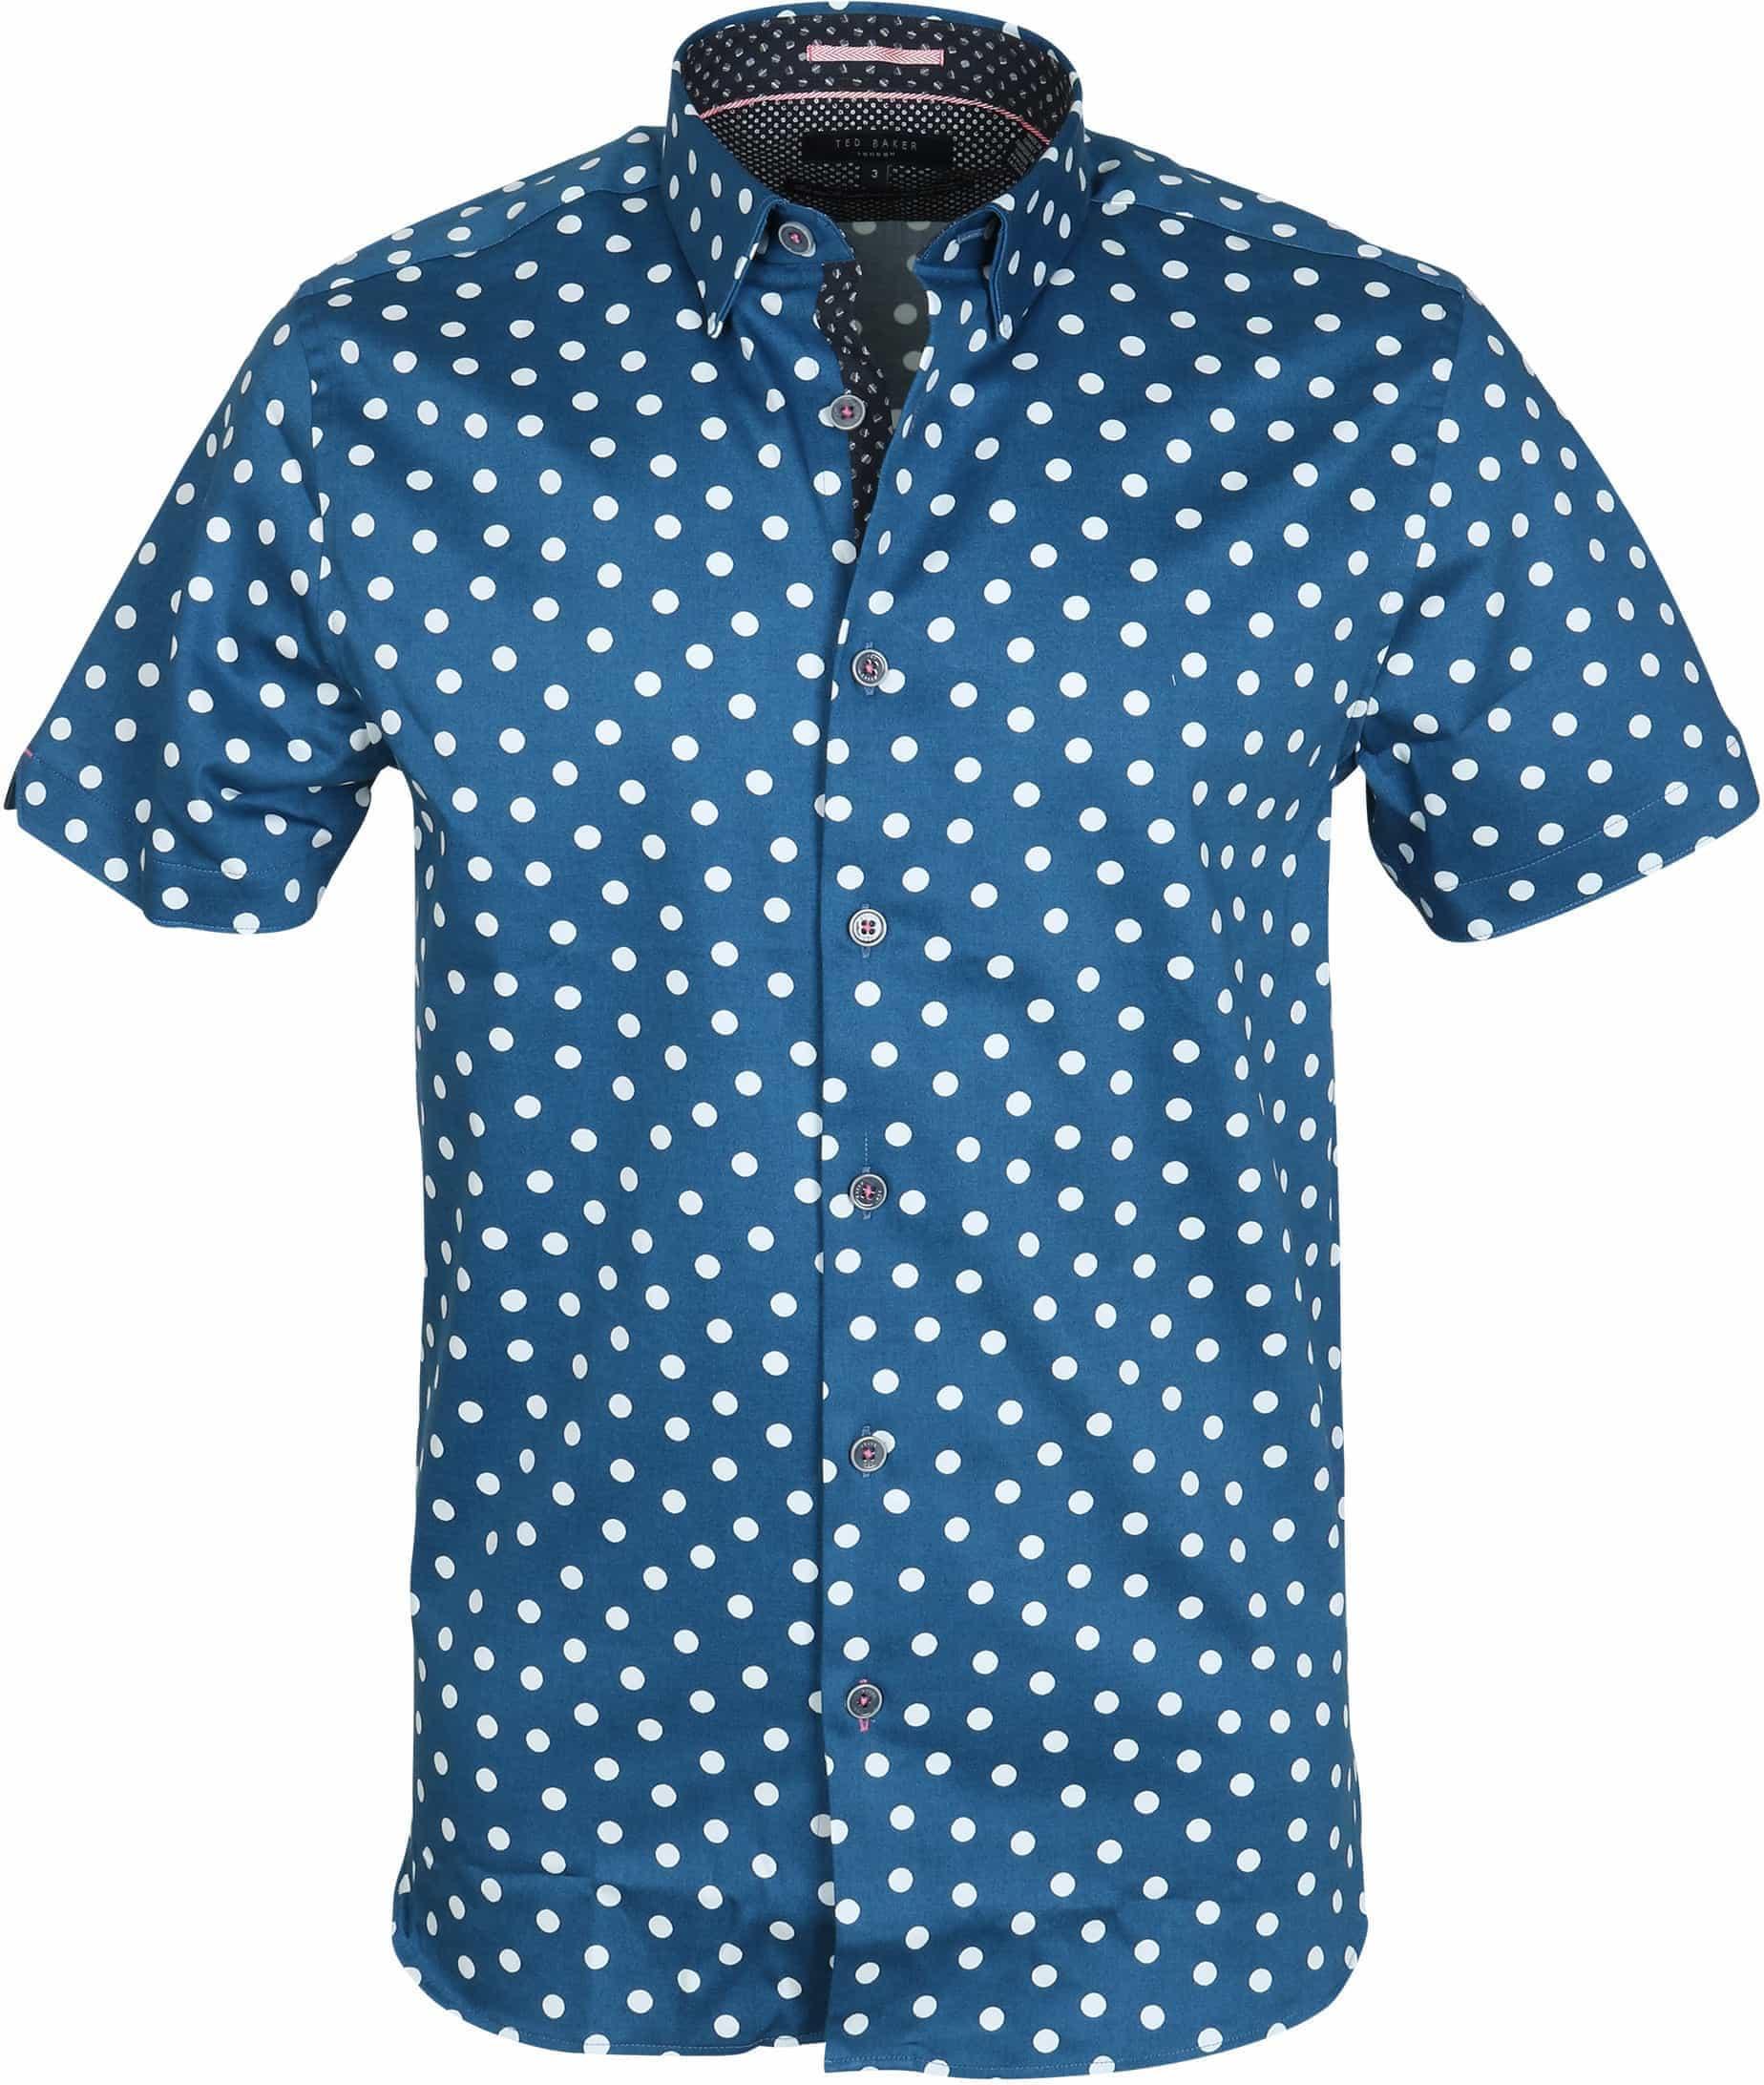 0da143d991c4 Ted Baker Hemd Blau Punkte 142068-13 online kaufen   Suitable